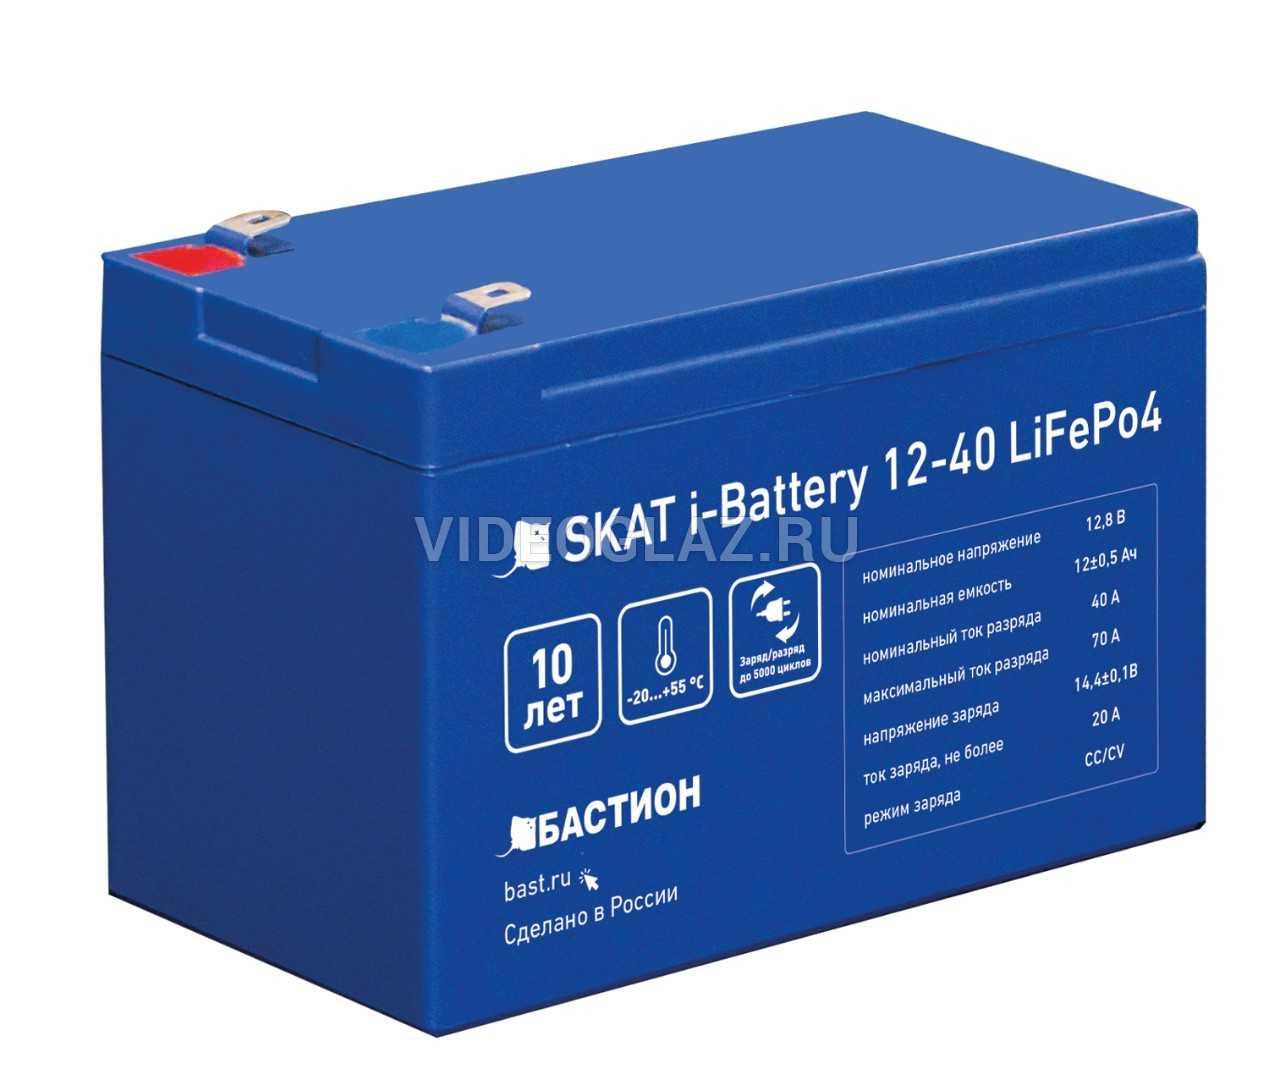 СКАТ Skat i-Battery 12-40 LiFePo4